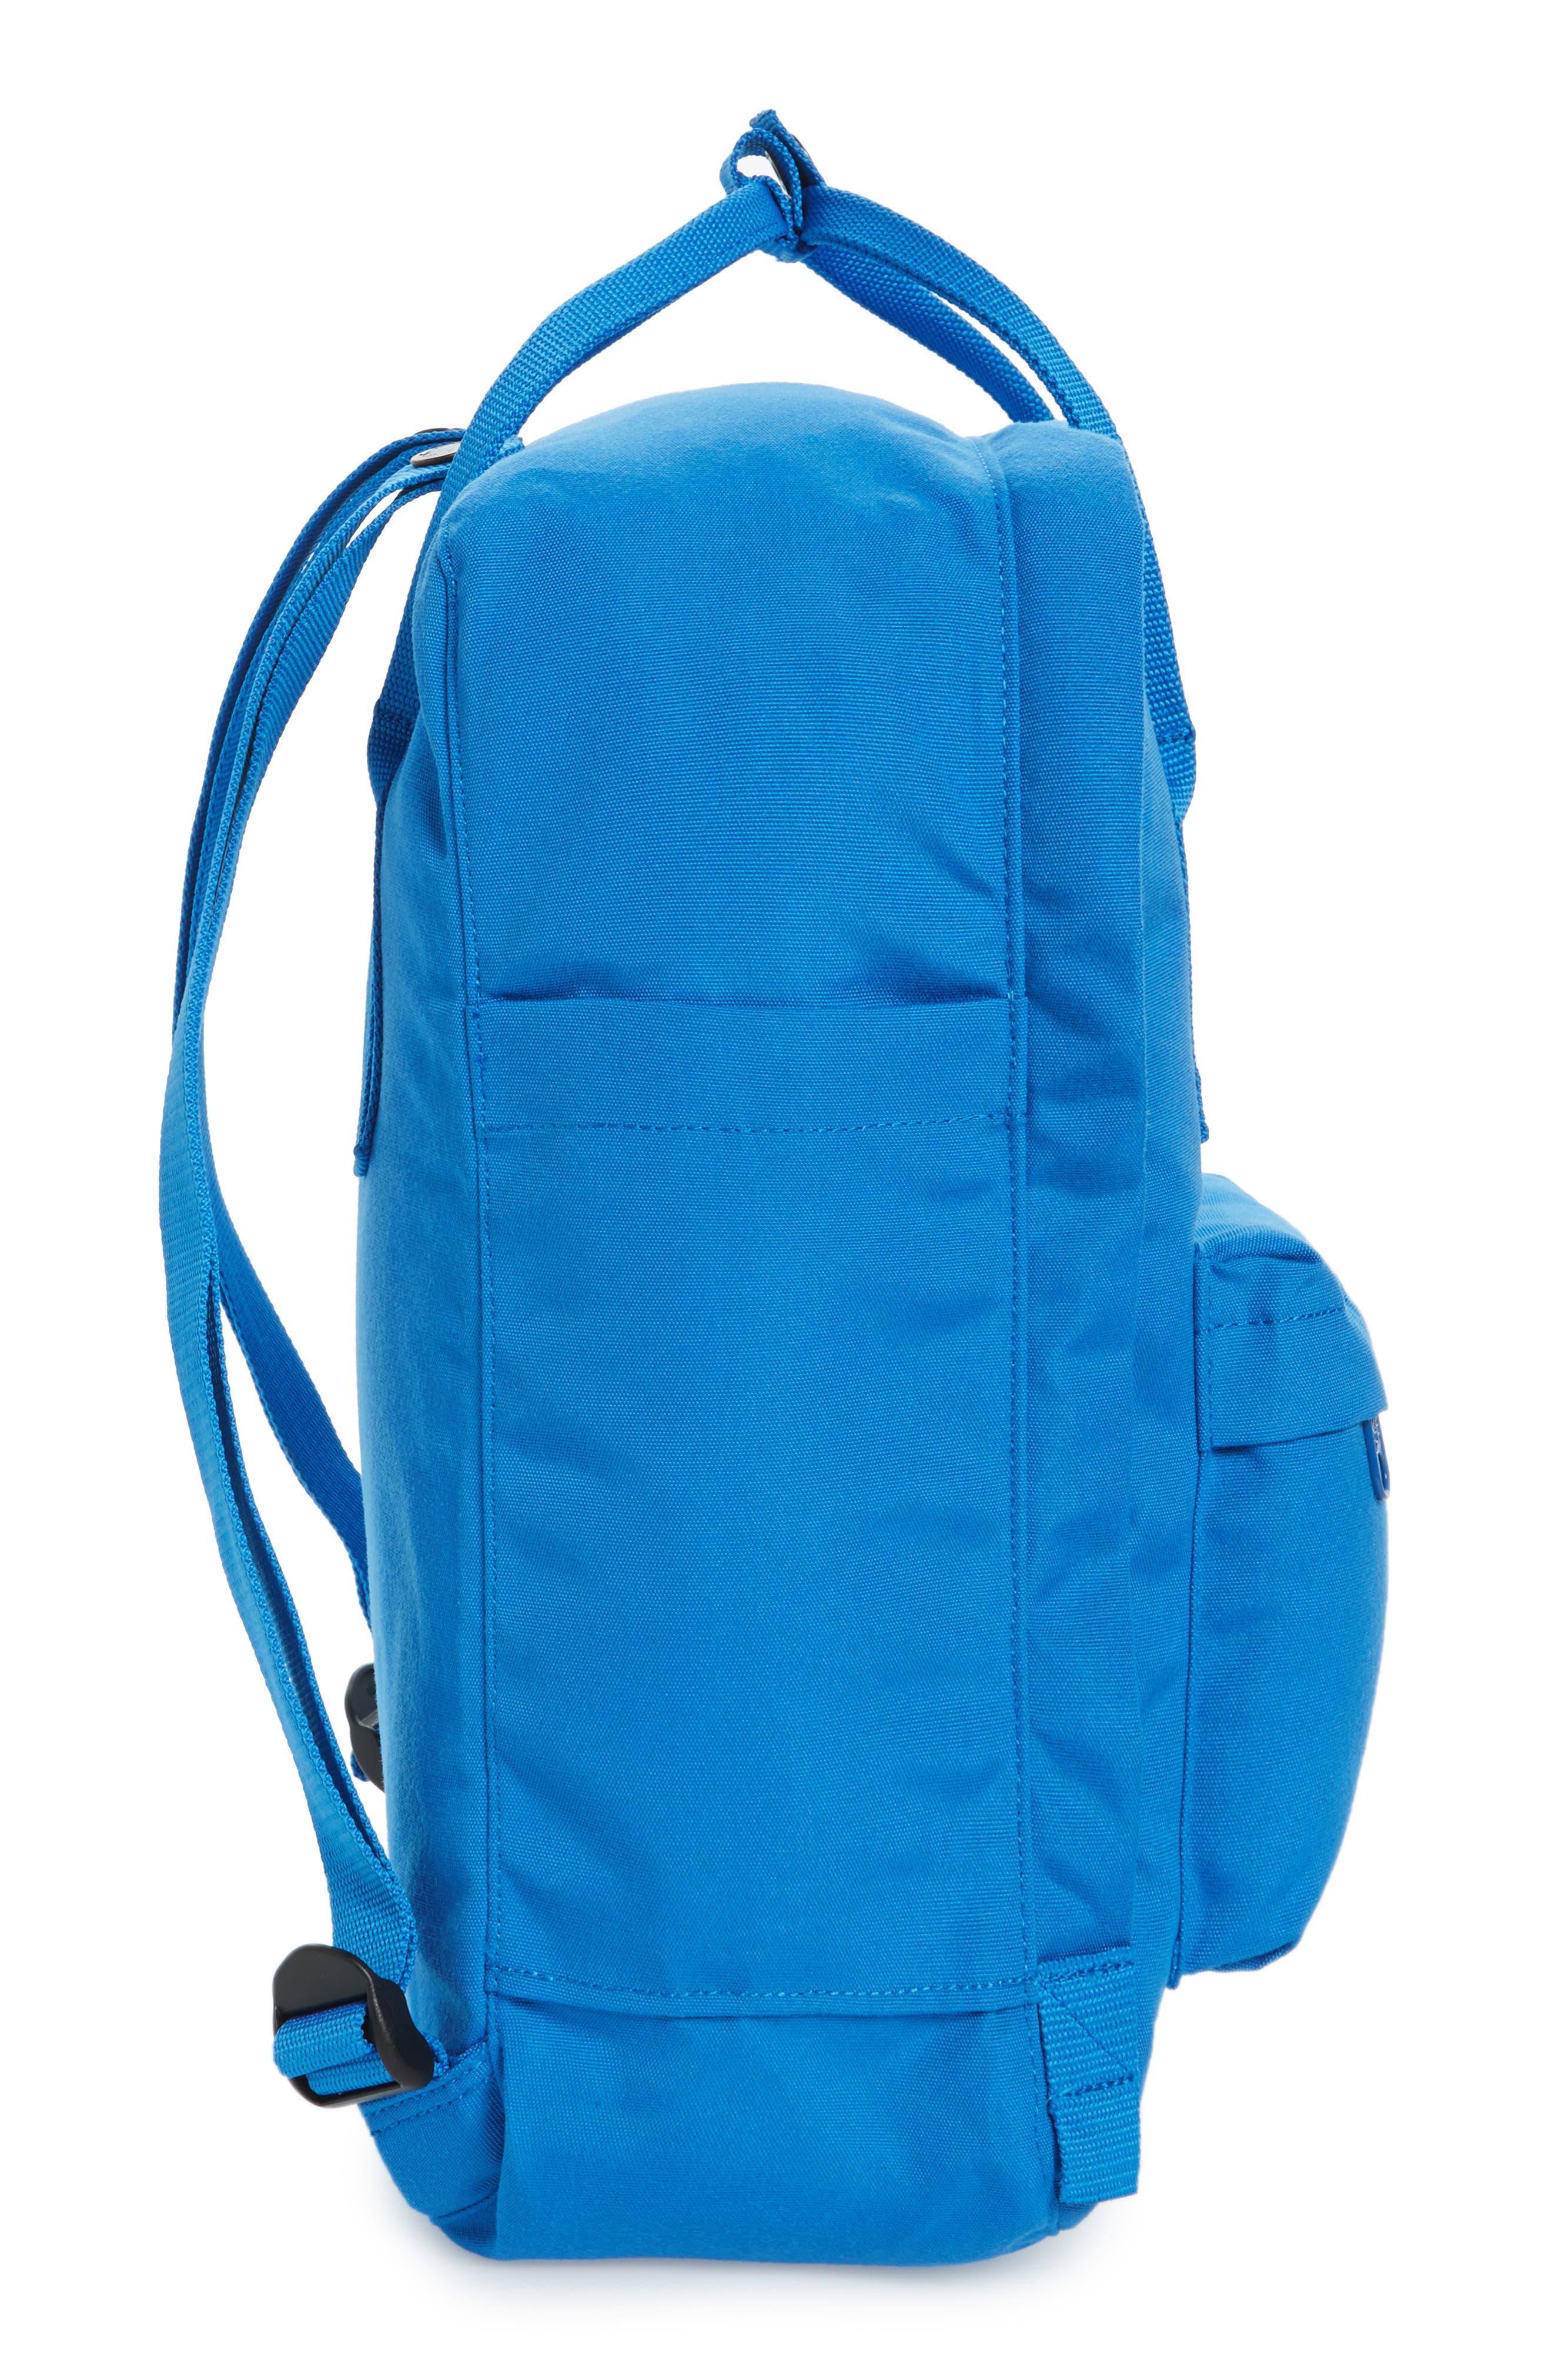 Re-Kånken Water Resistant Backpack,                             Alternate thumbnail 5, color,                             UN BLUE